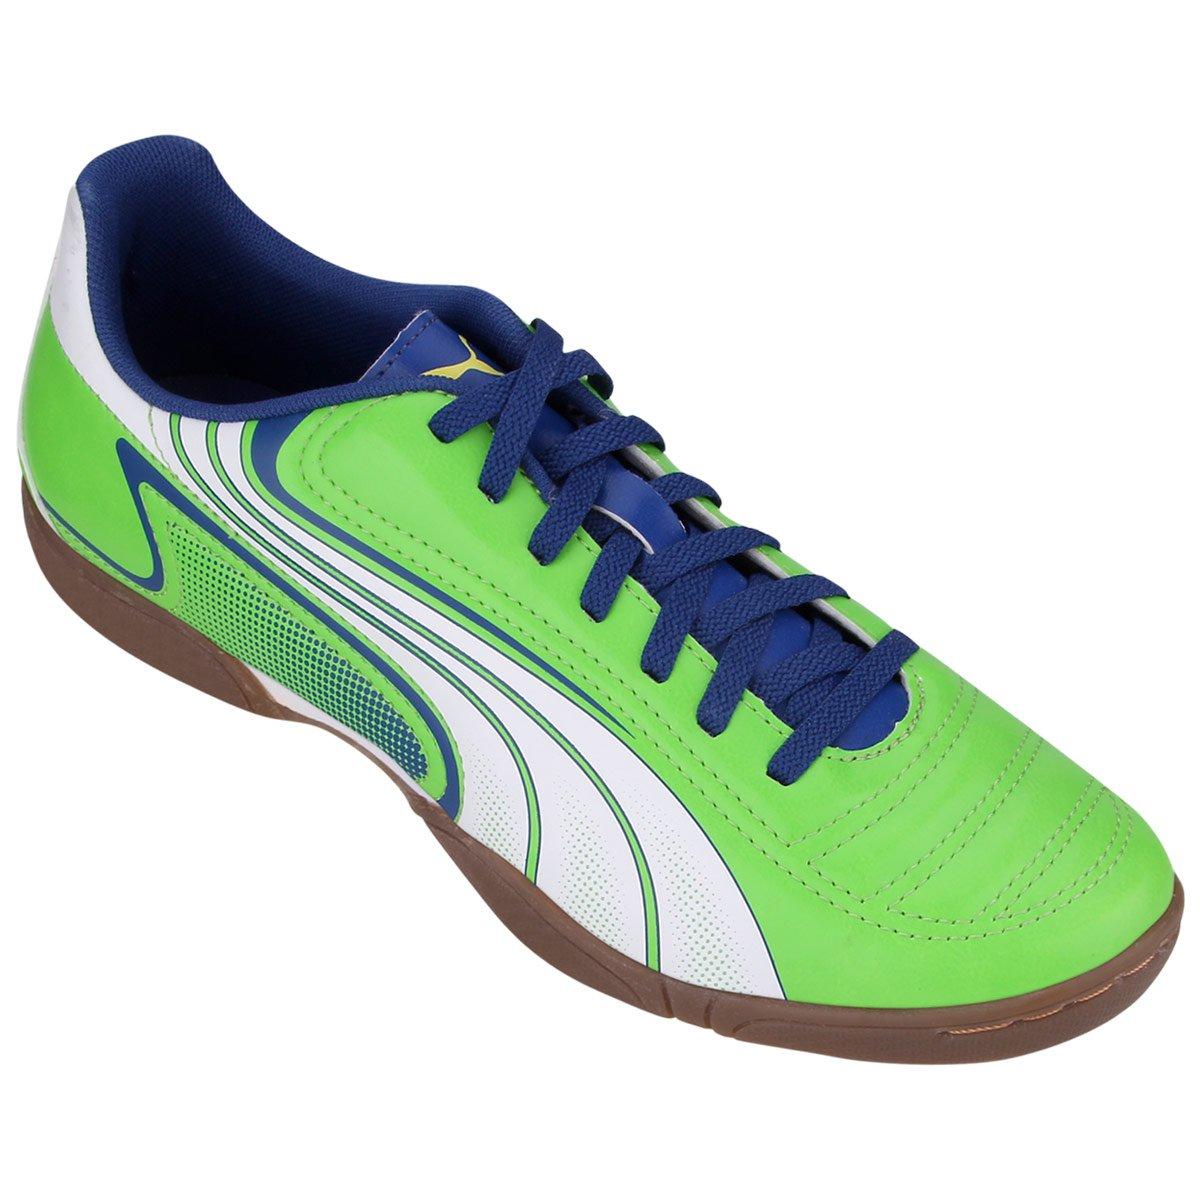 454799e46a9b0 Chuteira Puma V6.11 IT | Netshoes